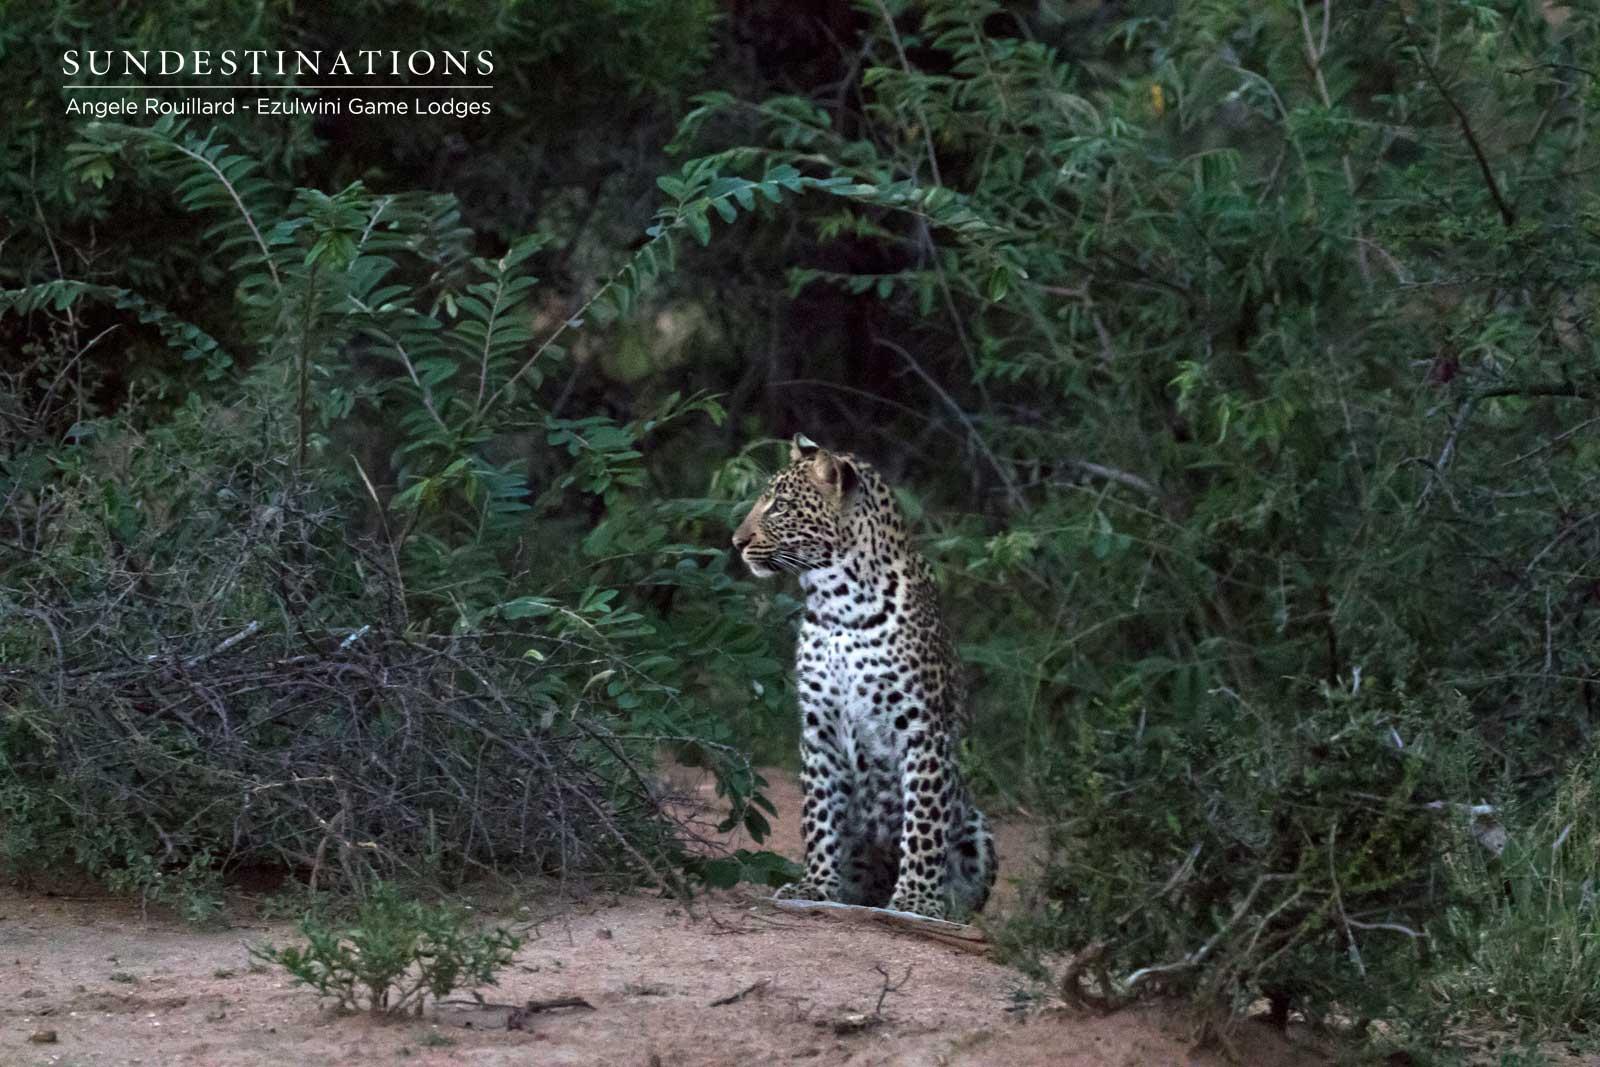 Ezulwini Leopard Cubs in the Balule